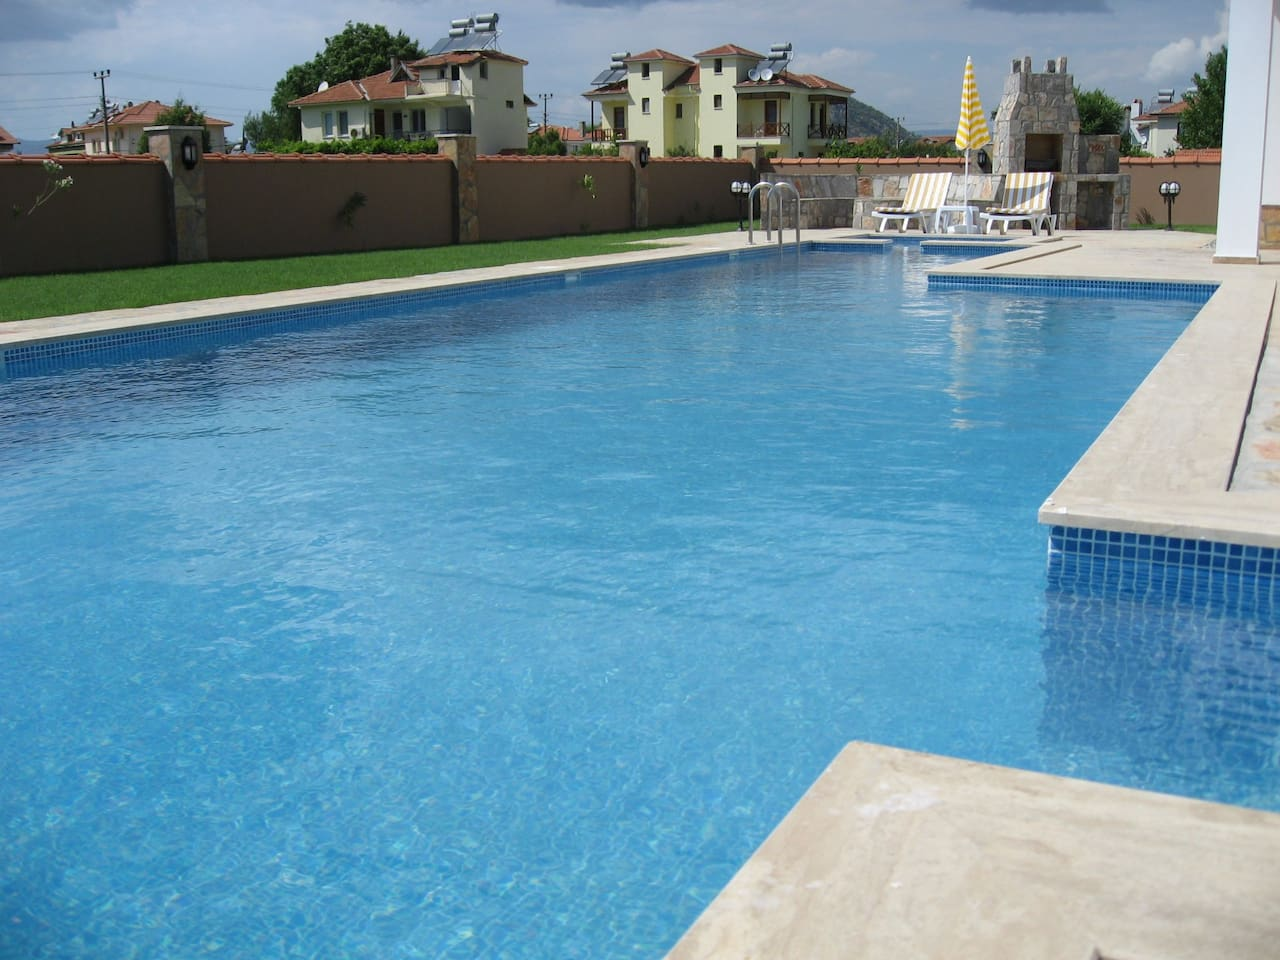 14 metre length private swimming pool